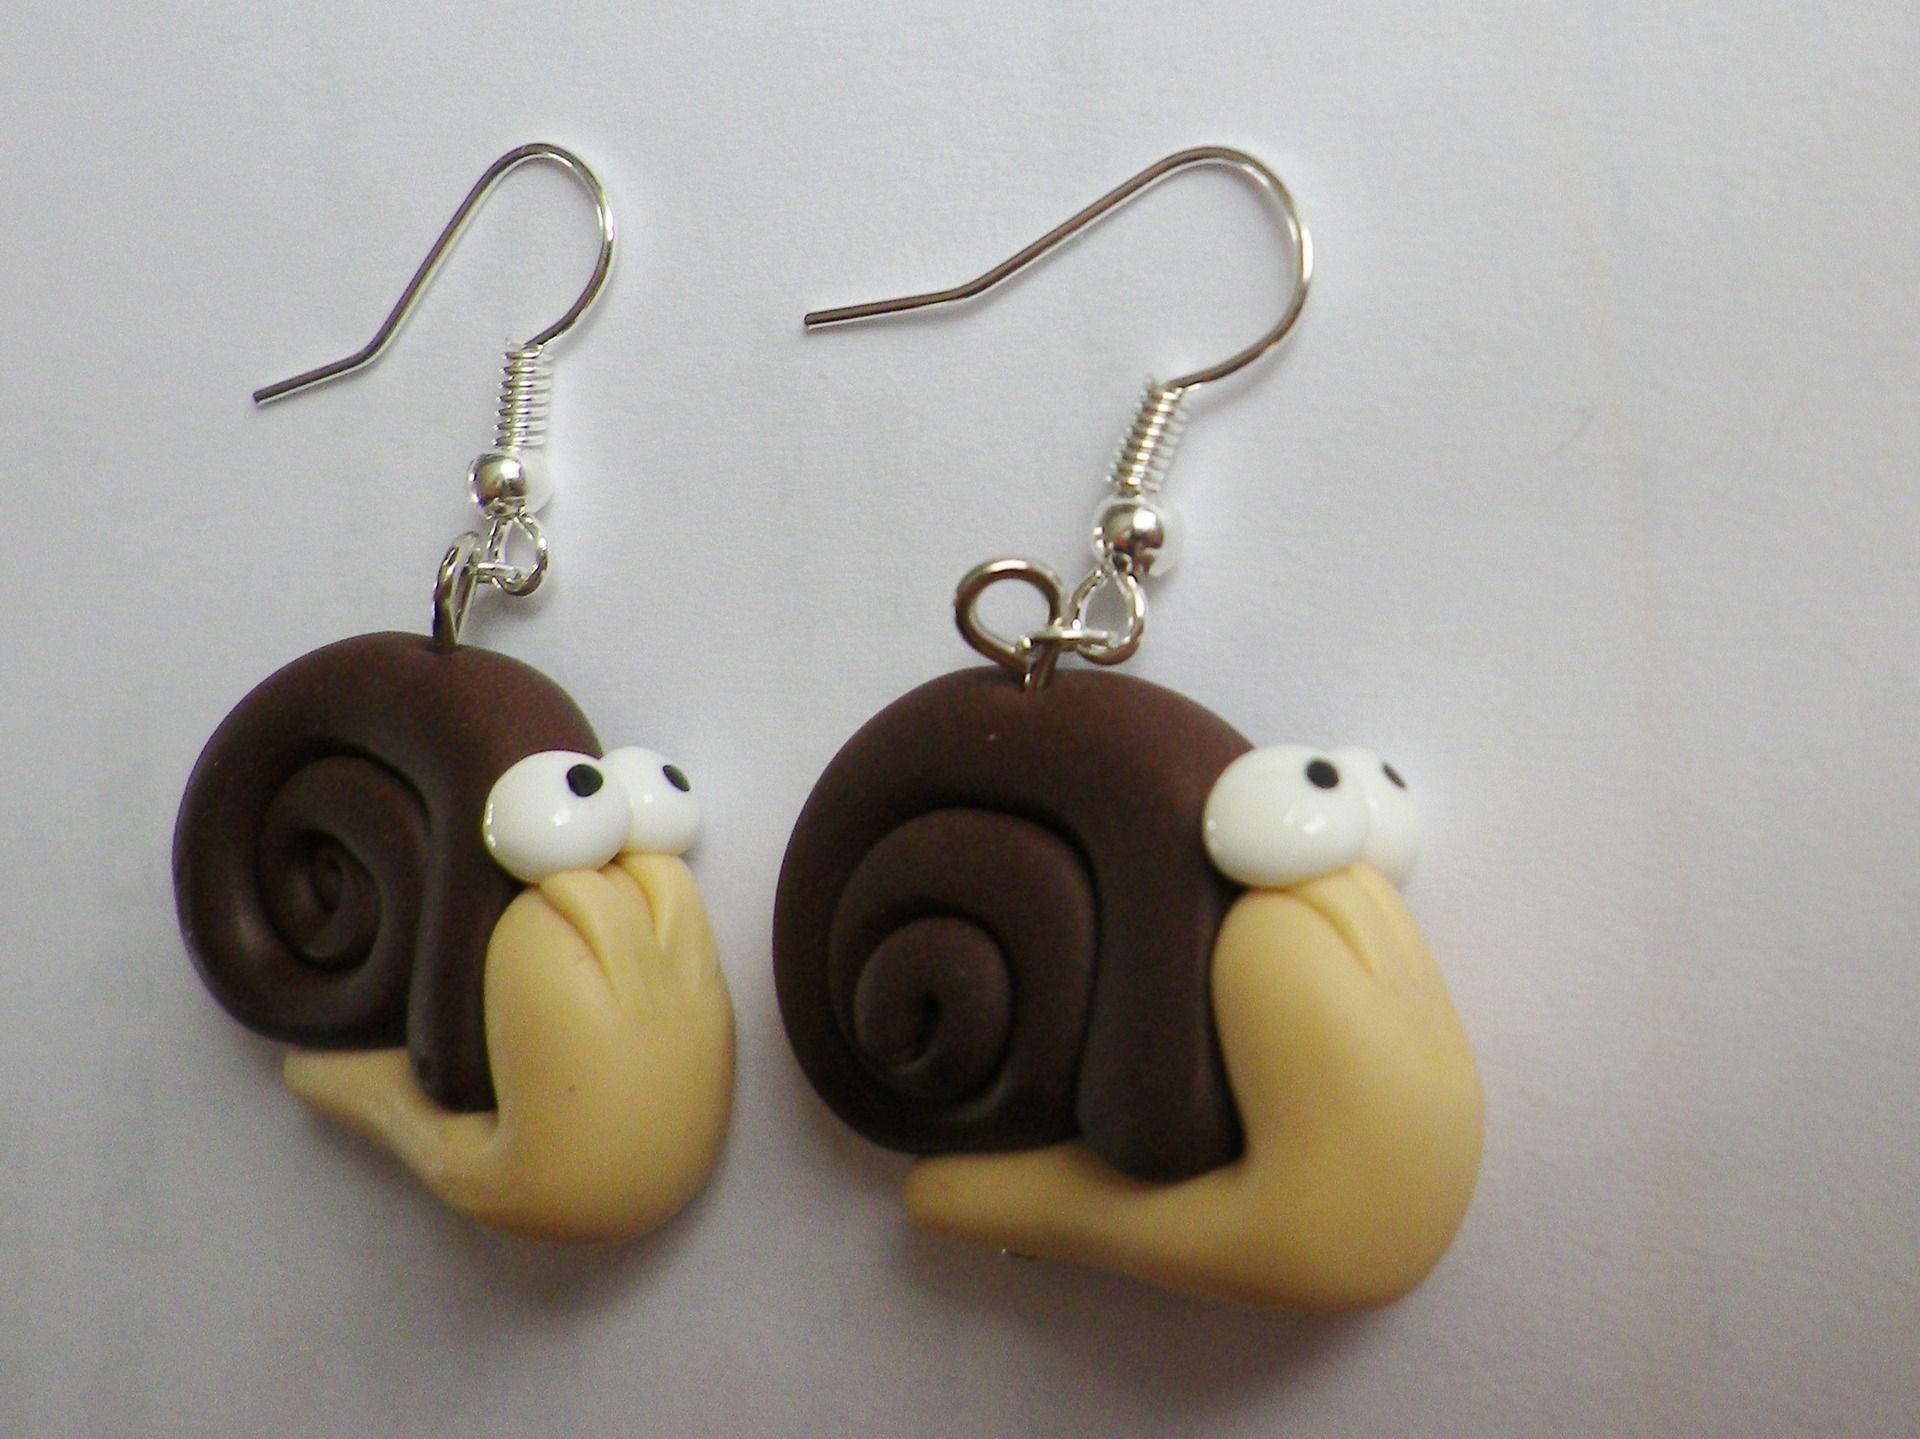 escargot rigolo en boucle d oreille coquille marron yeux mignon : Boucles d'oreille par fimo-relie